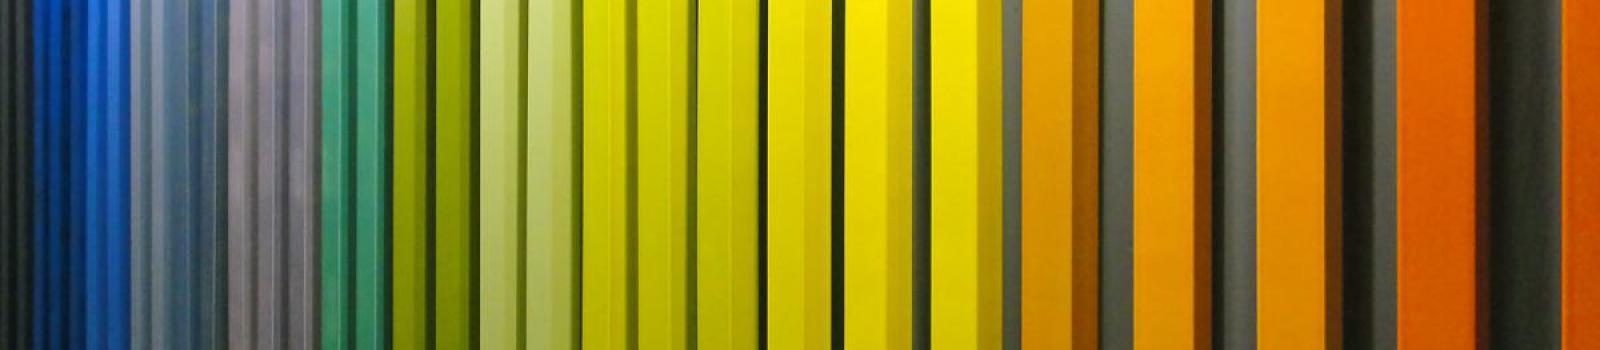 baguettes fachada colores